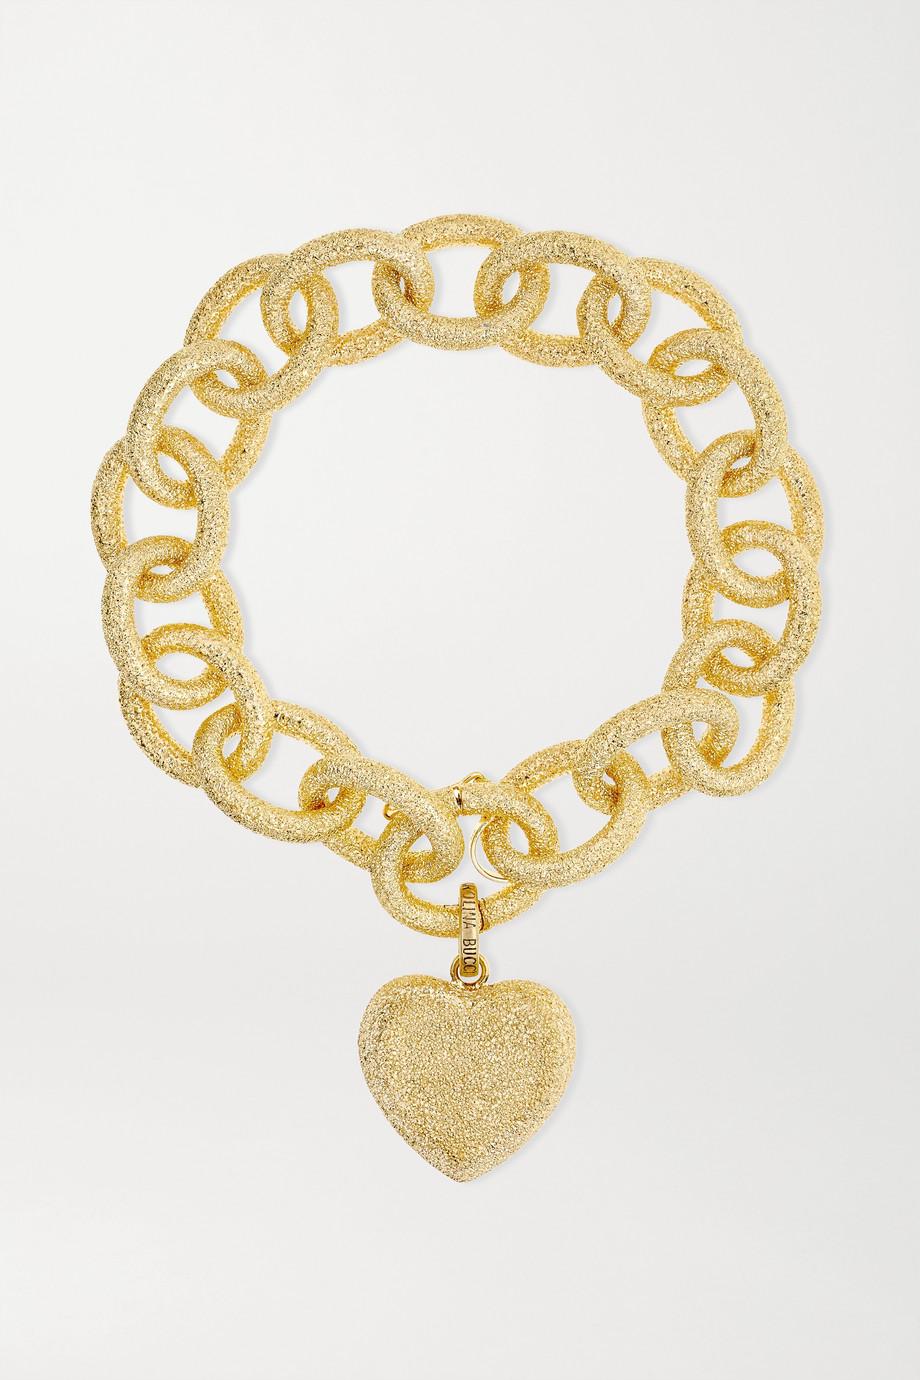 Carolina Bucci Florentine 18-karat gold bracelet